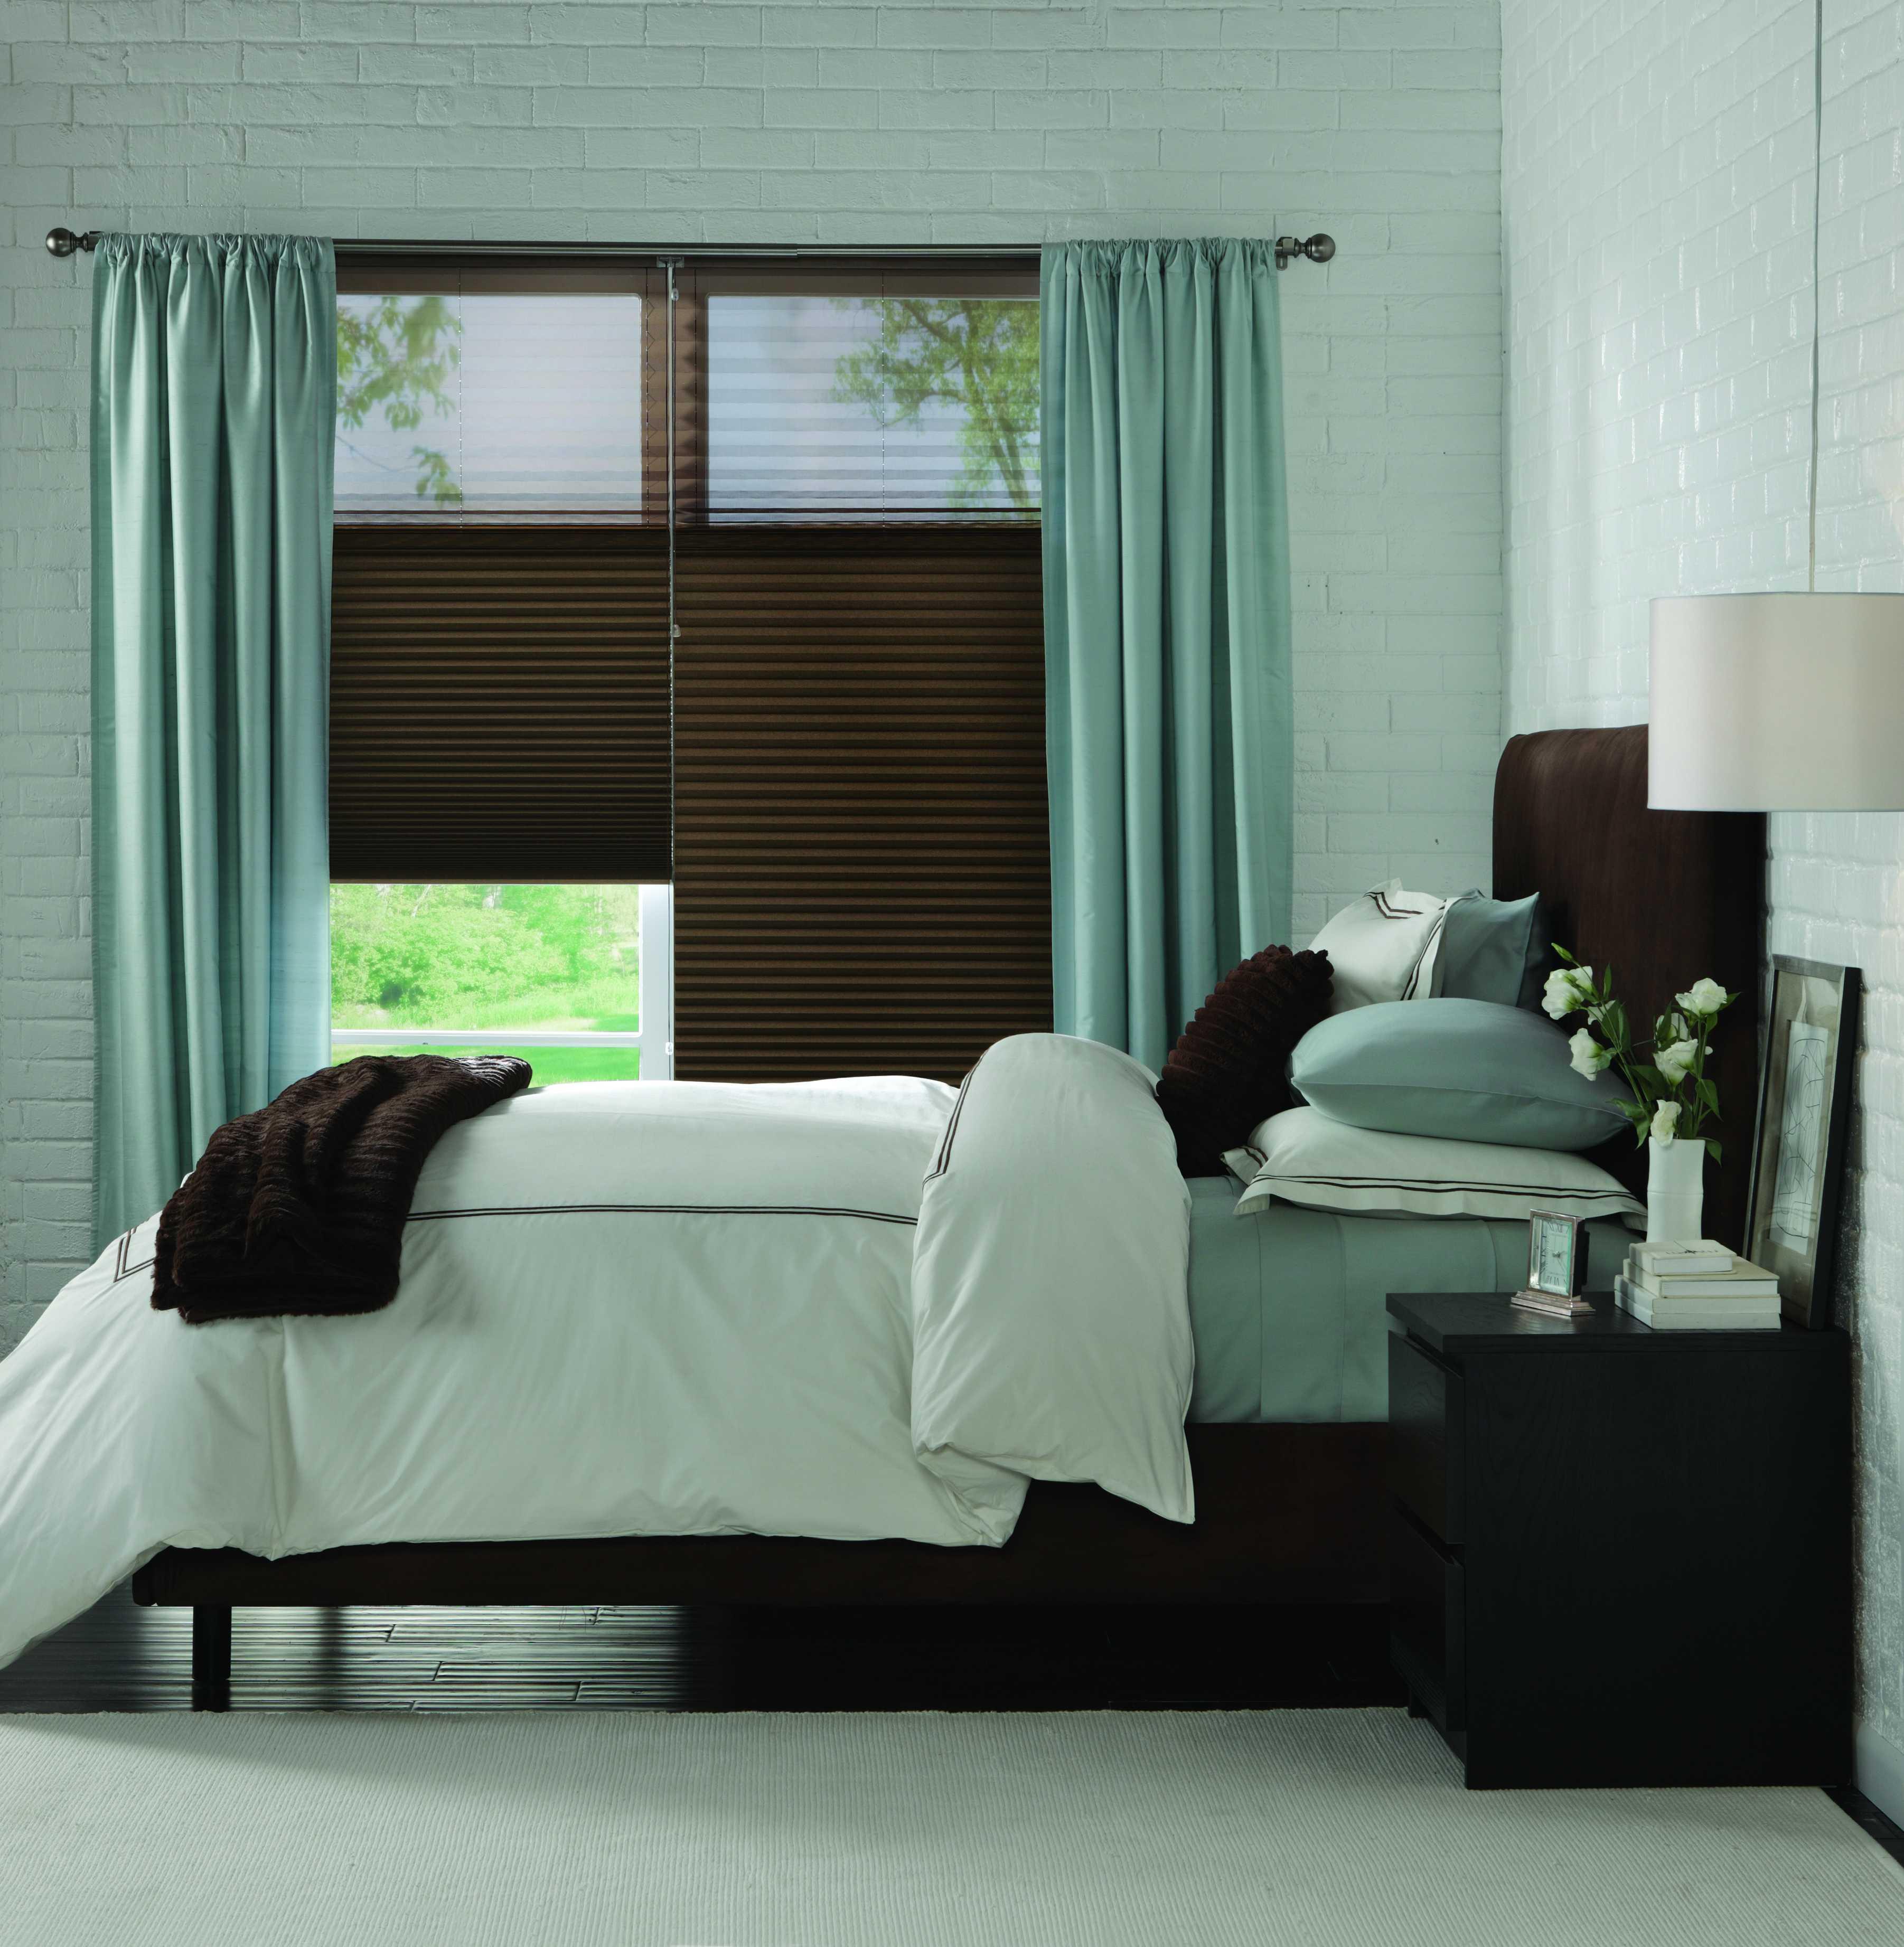 1 2 3 4 6 7 8 for Bedroom window dressing ideas